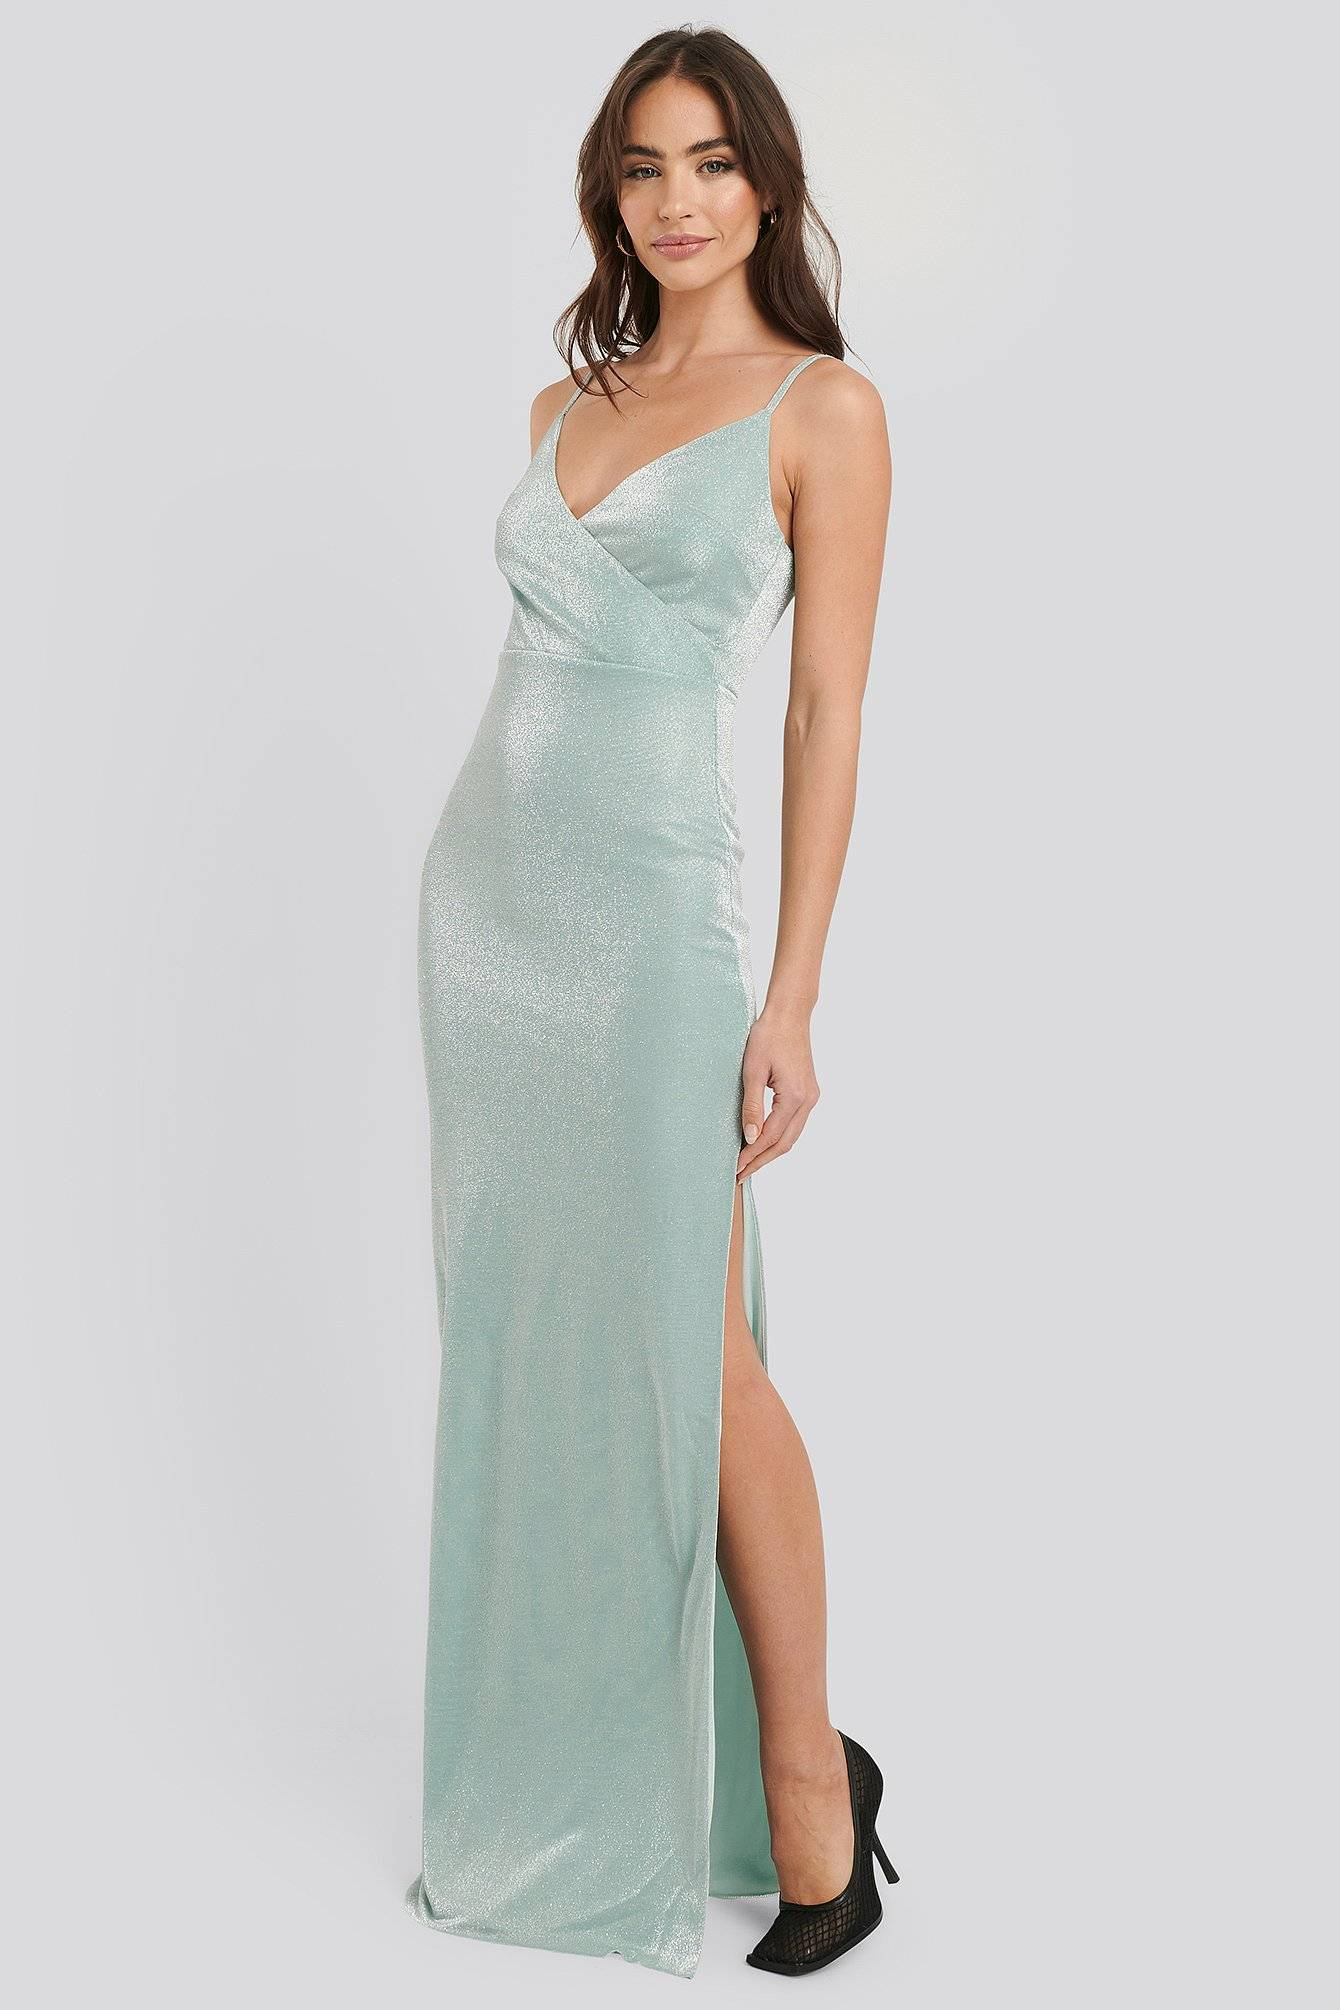 Image of Trendyol Sparkly Split Maxi Dress - Green